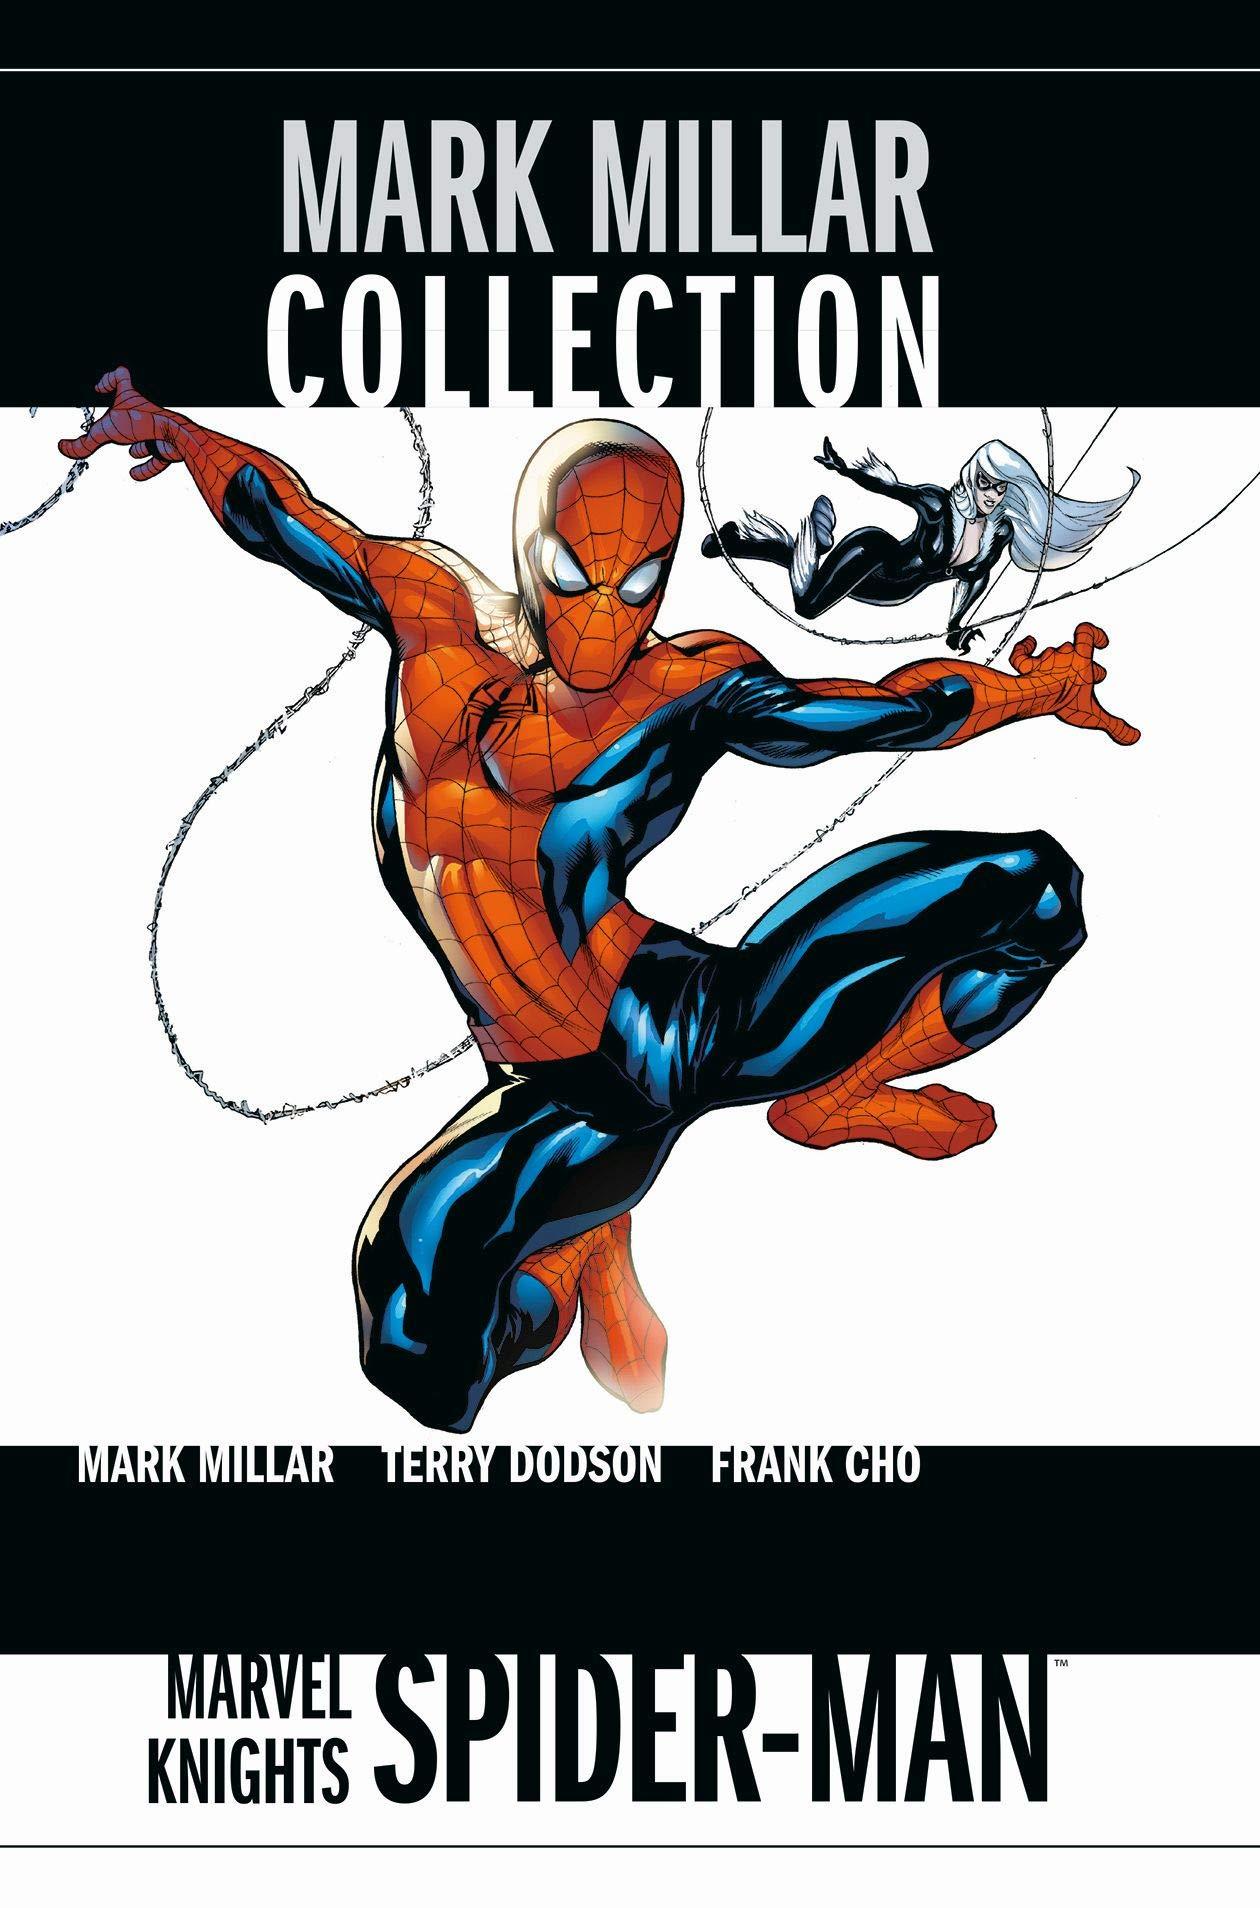 Mark Millar Collection: Bd. 8: Marvel Knights: Spider-Man Gebundenes Buch – 22. Oktober 2018 Terry Dodson Frank Cho Michael Strittmatter Panini